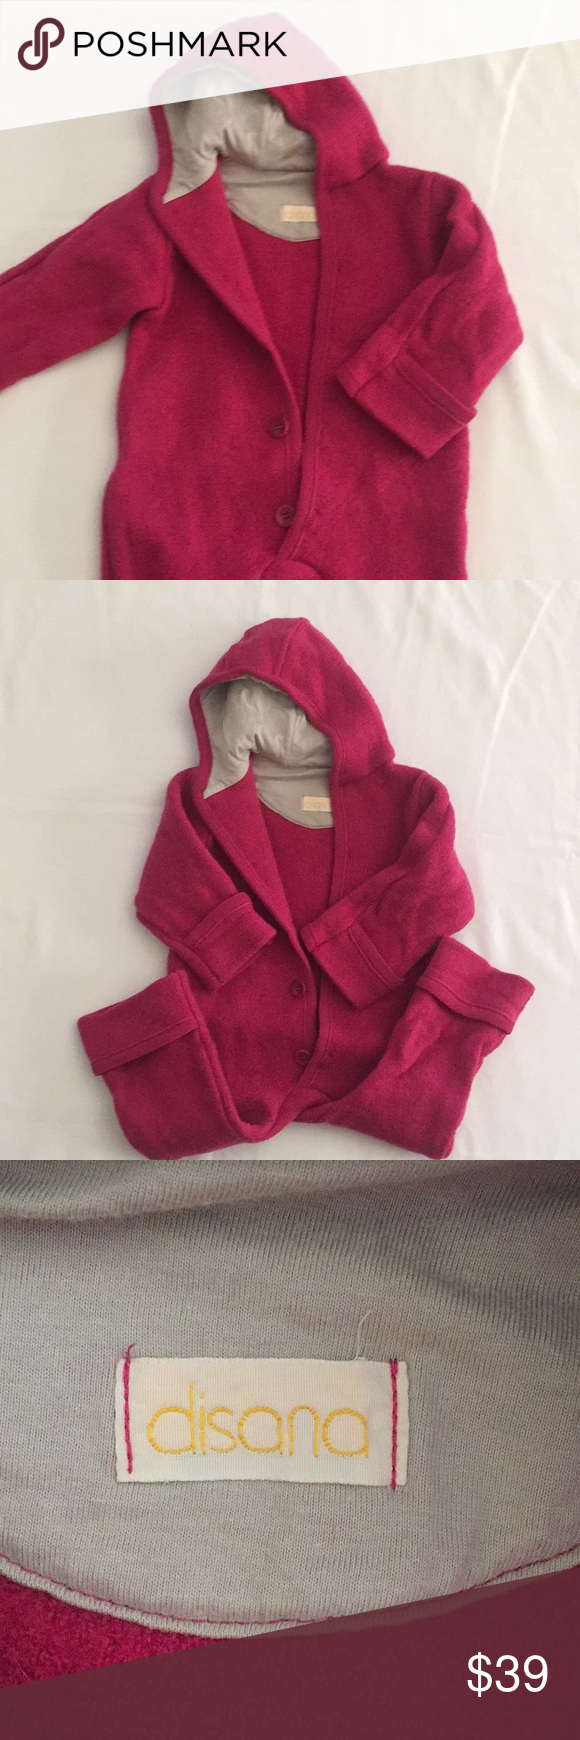 04ebd482425d Disana Organic Bunting 100% Organic boiled wool baby bunting hooded ...